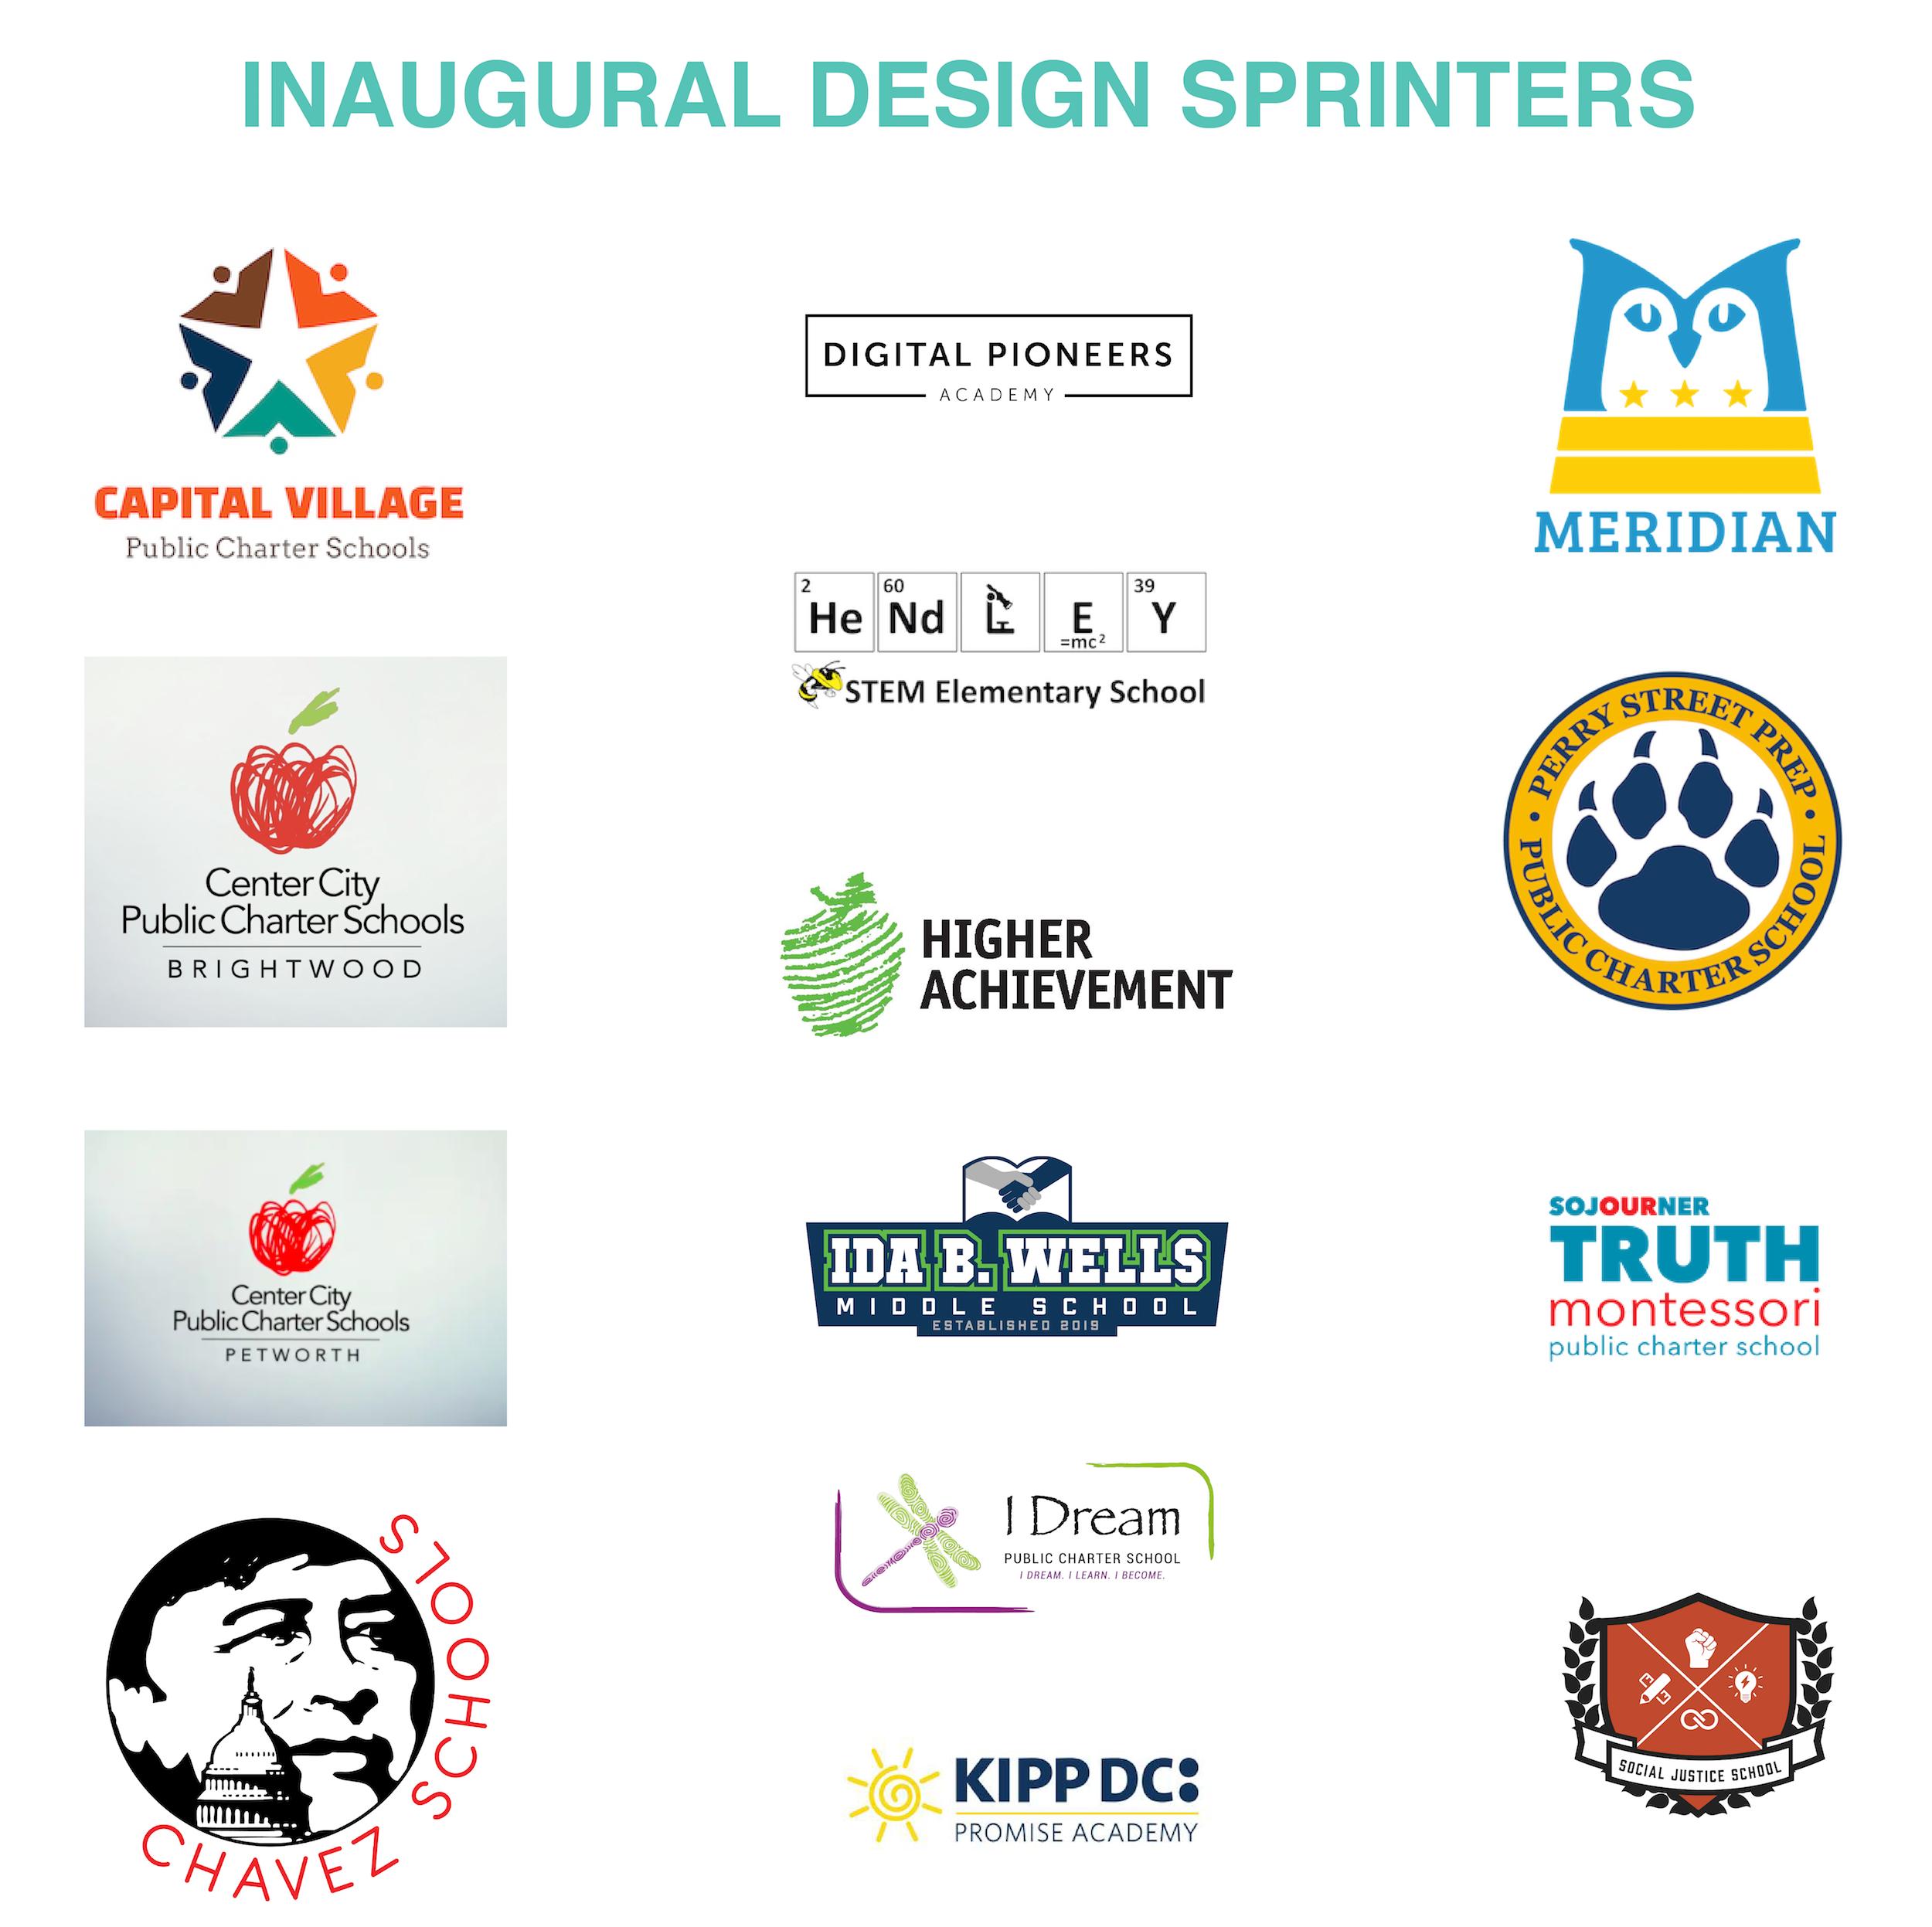 Design Sprinters